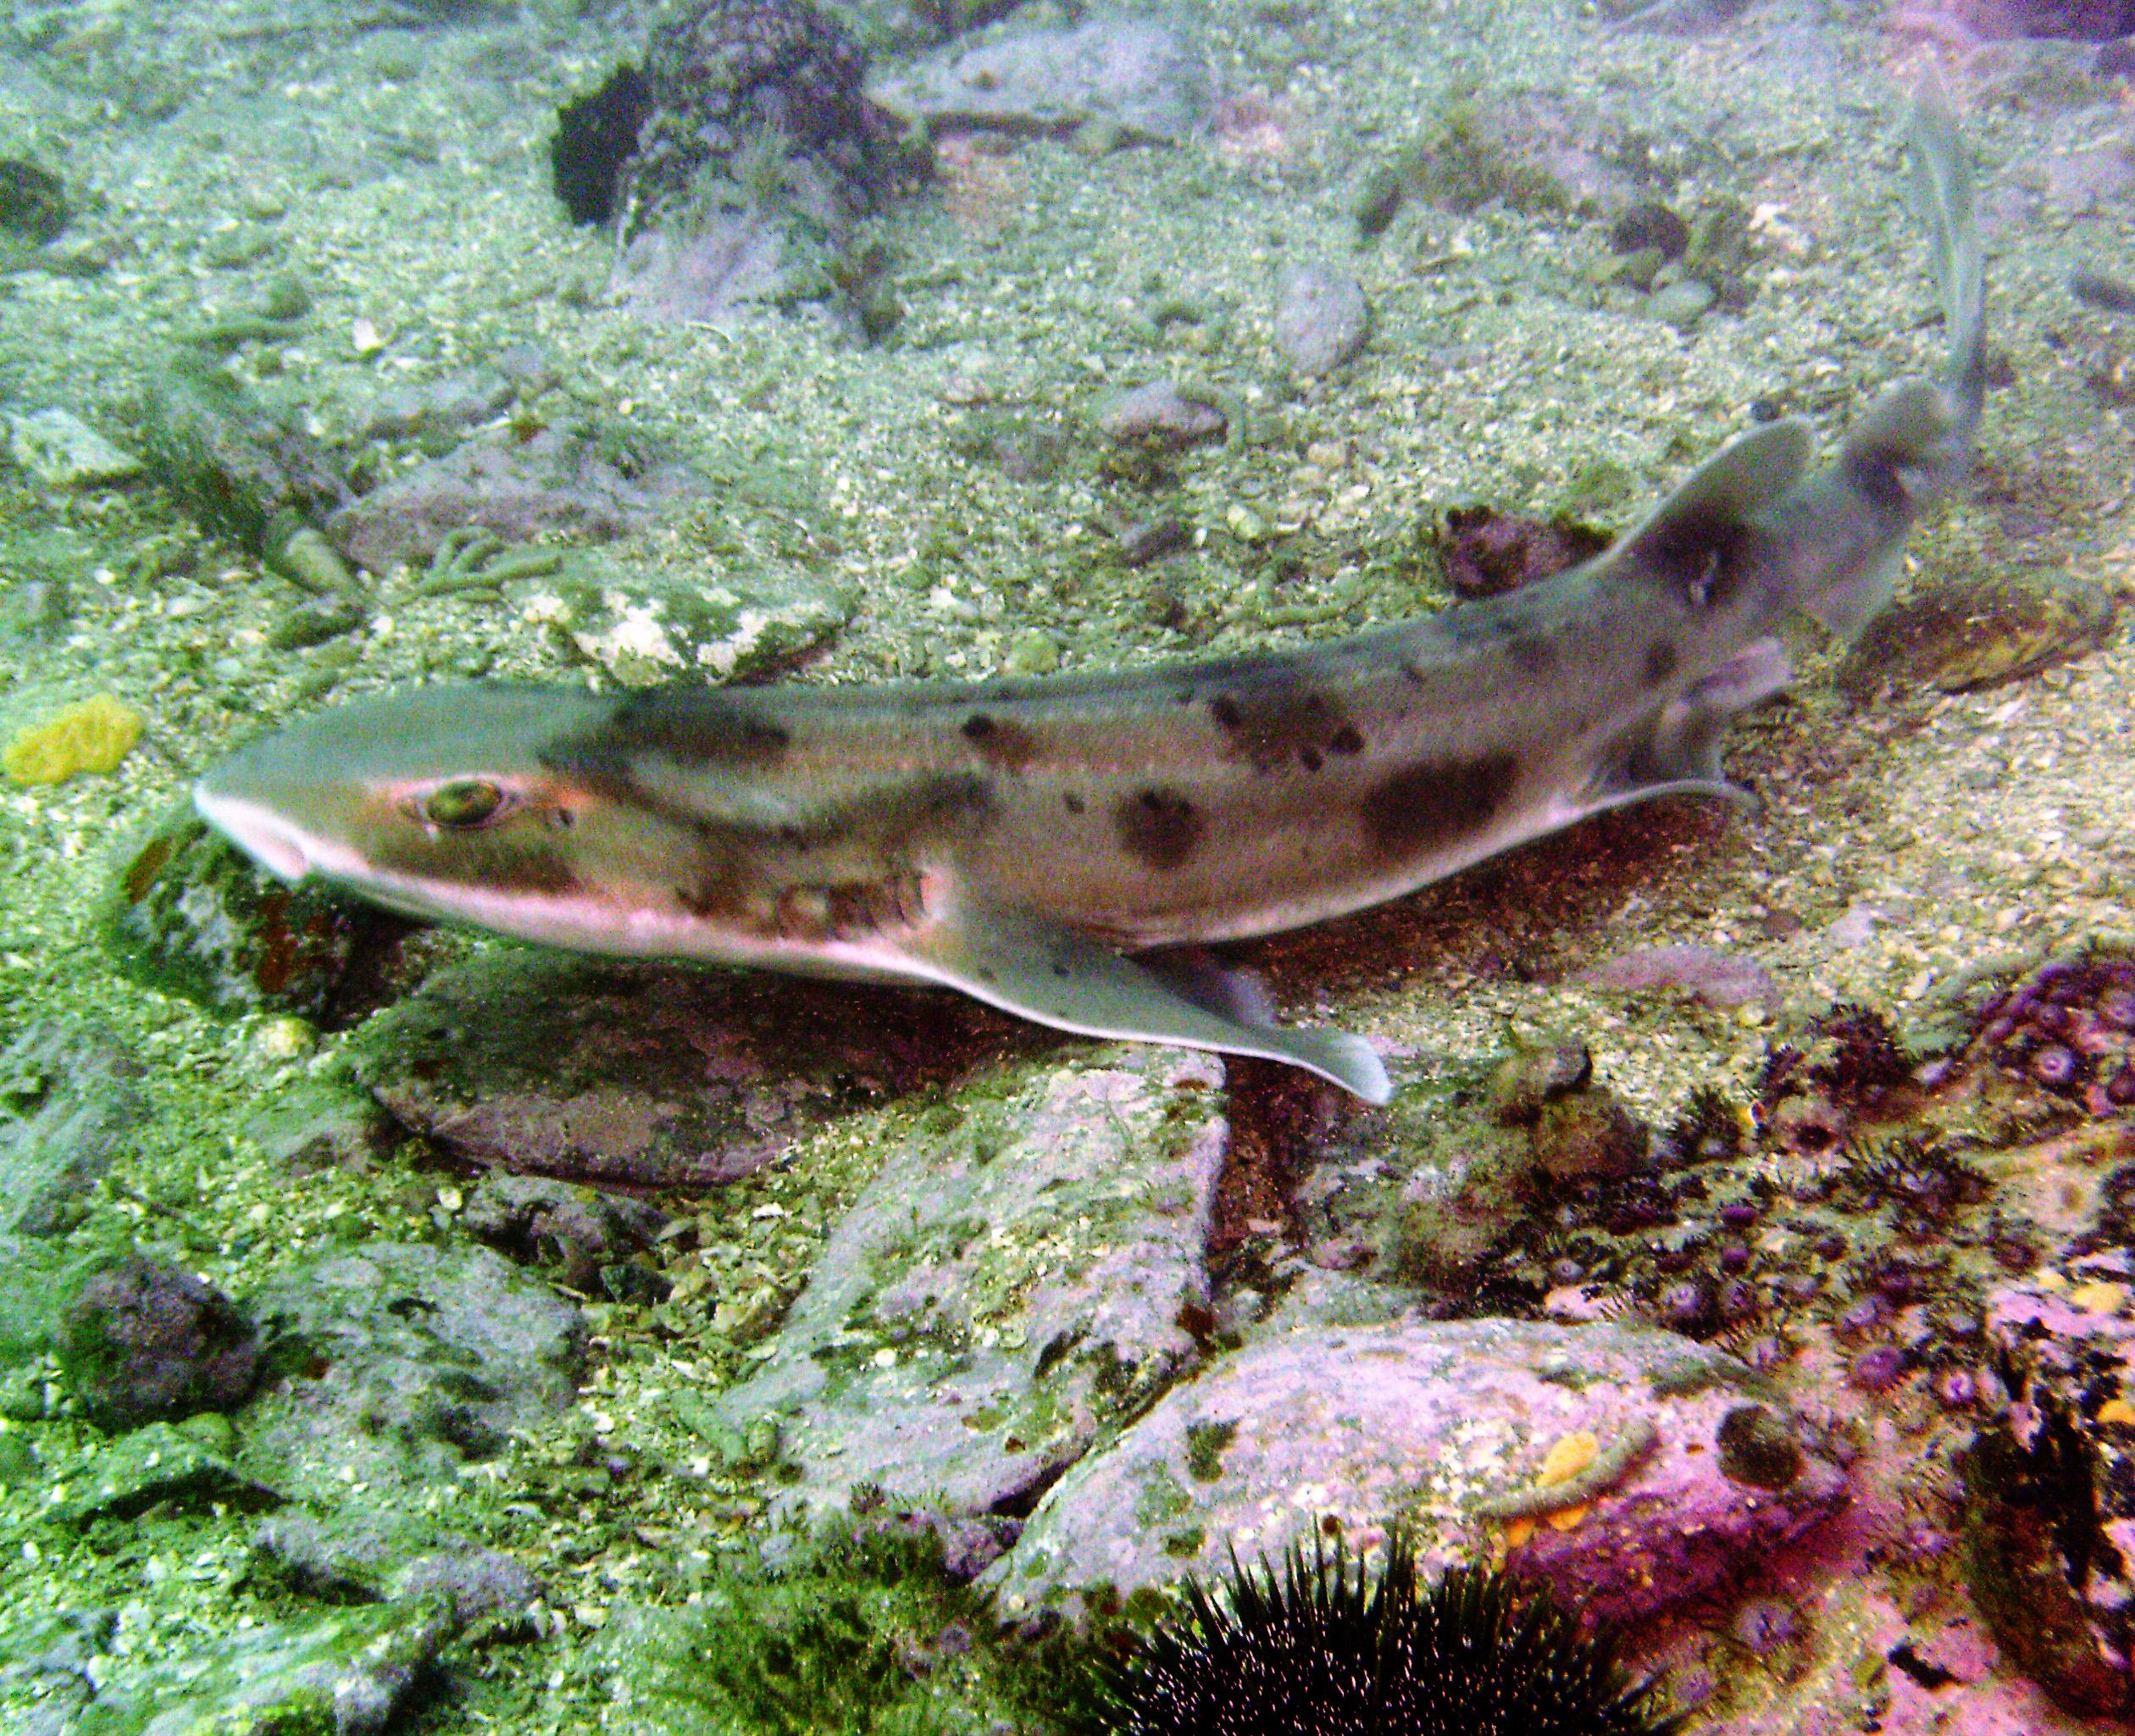 Draughsboard shark